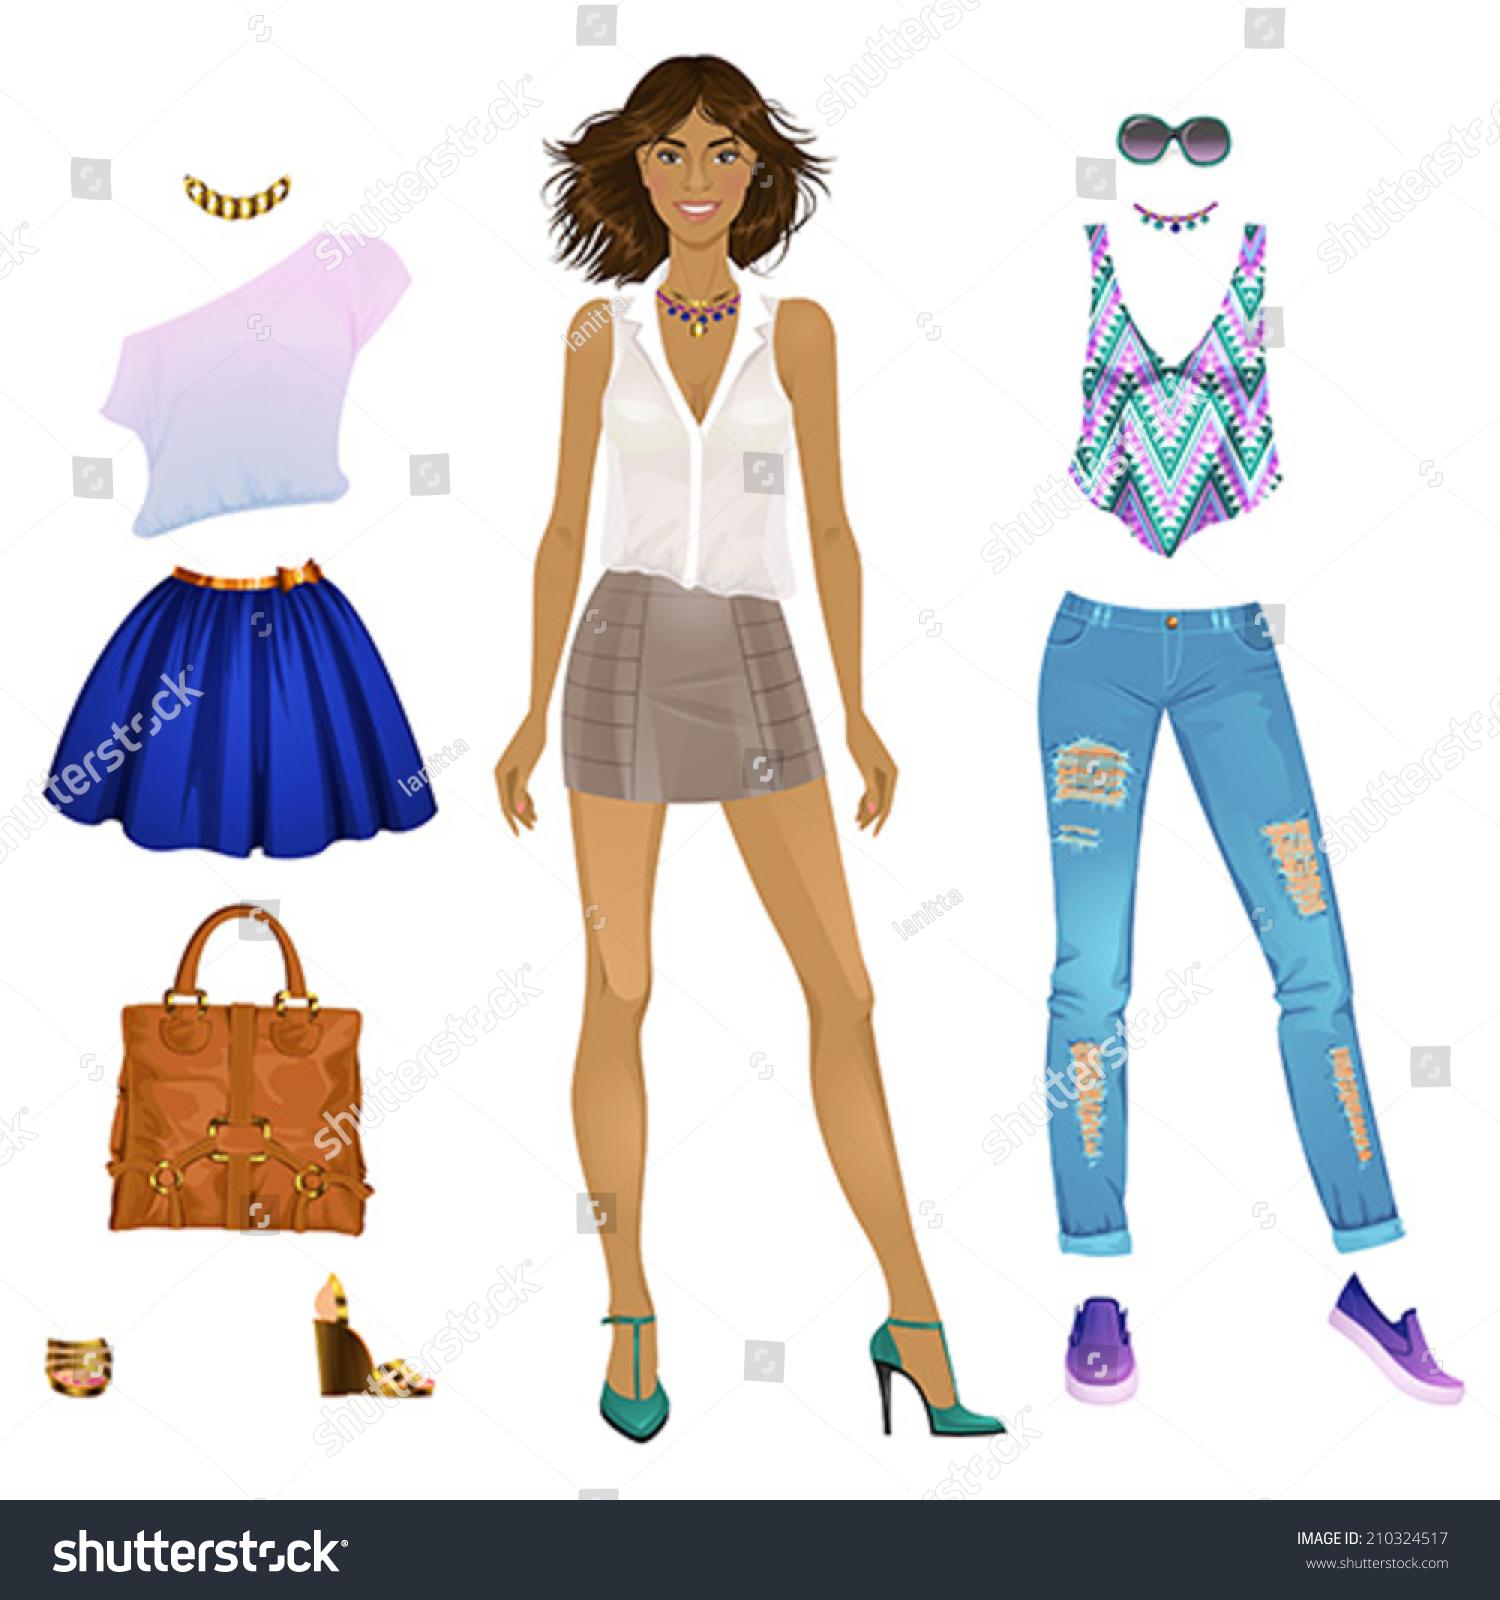 paper doll template woman - beautiful dress paper doll black woman stock vector